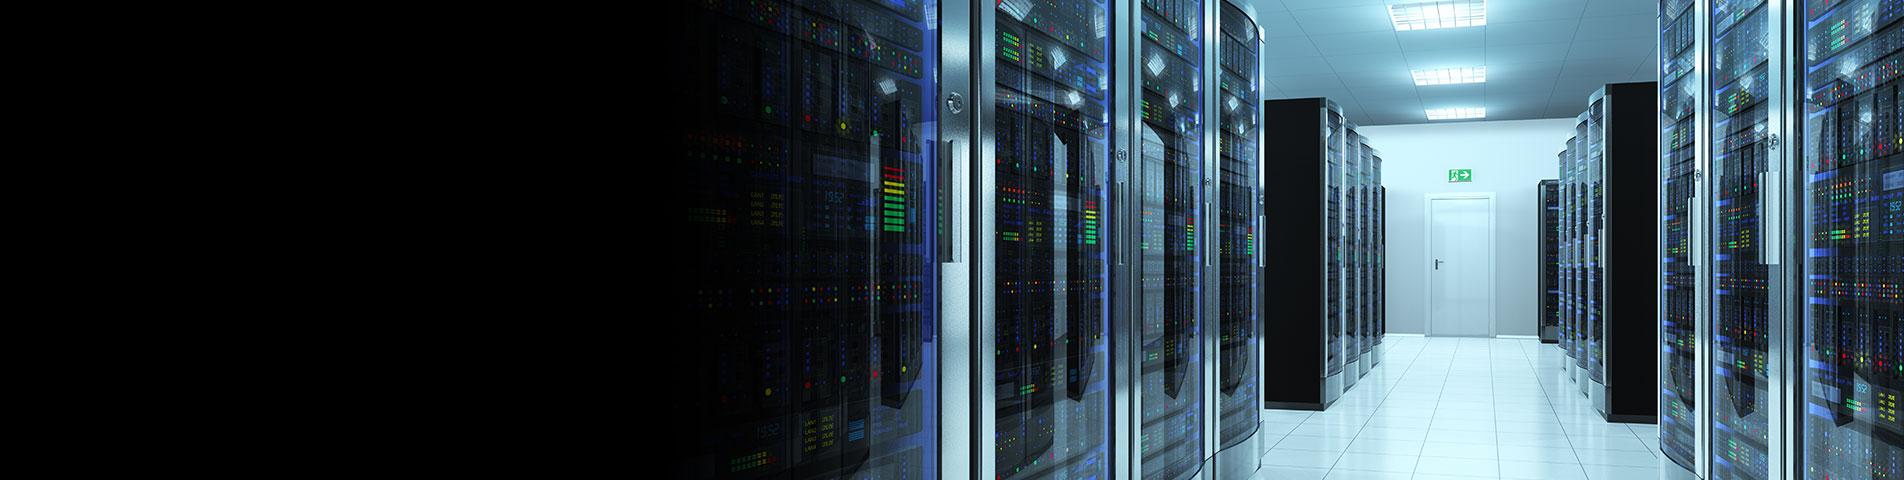 slide-02-dedicated-servers